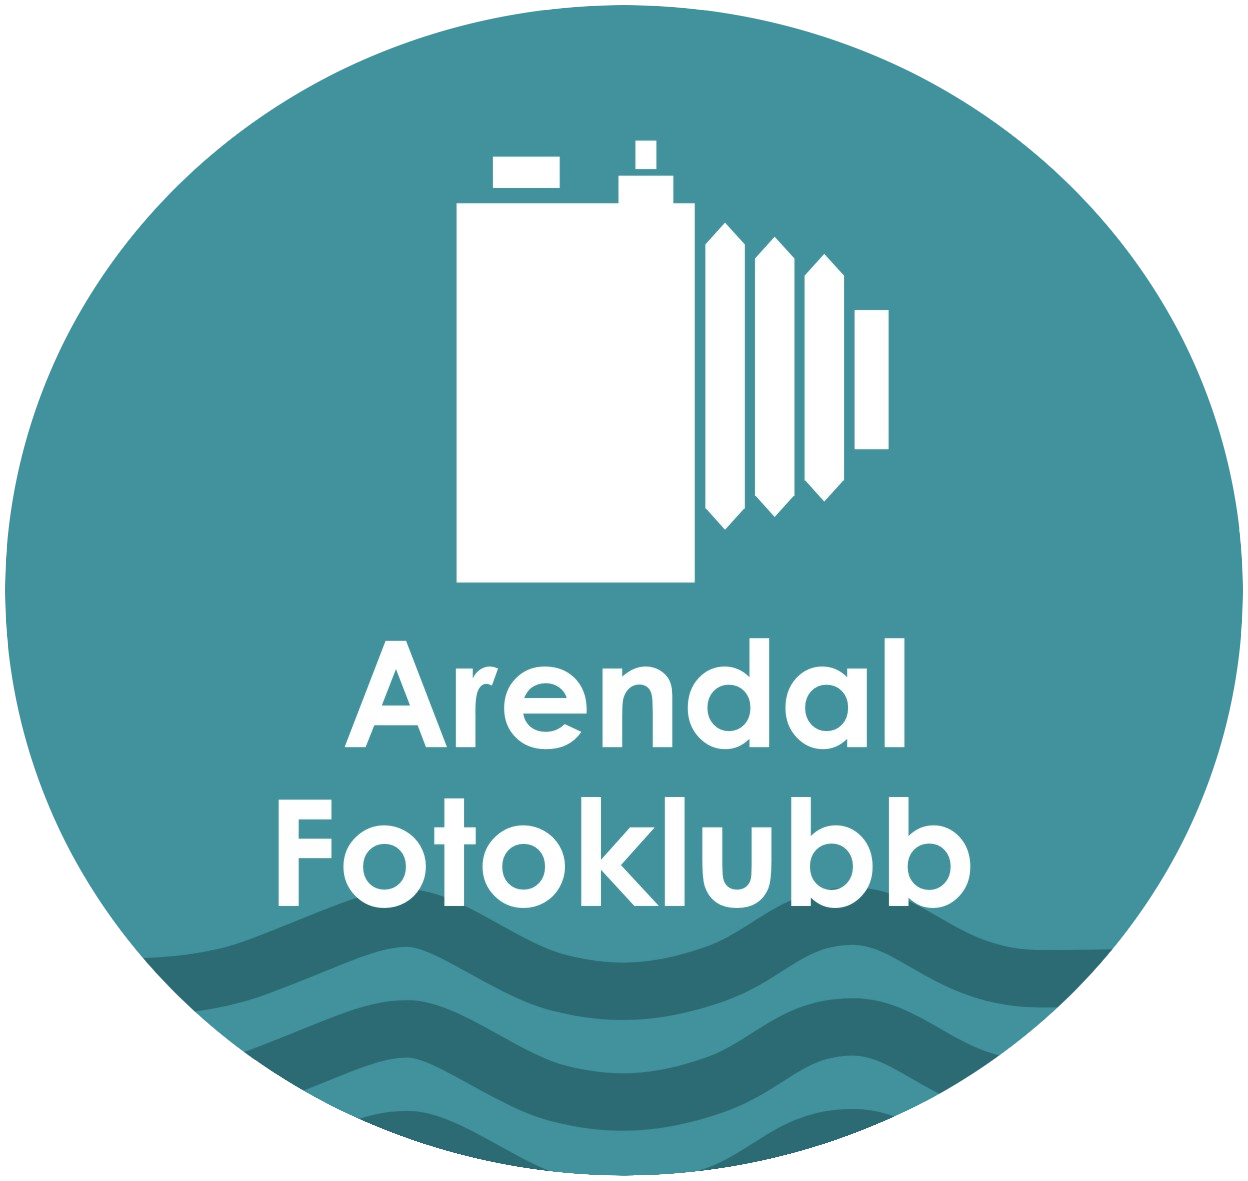 Arendal fotoklubb logo